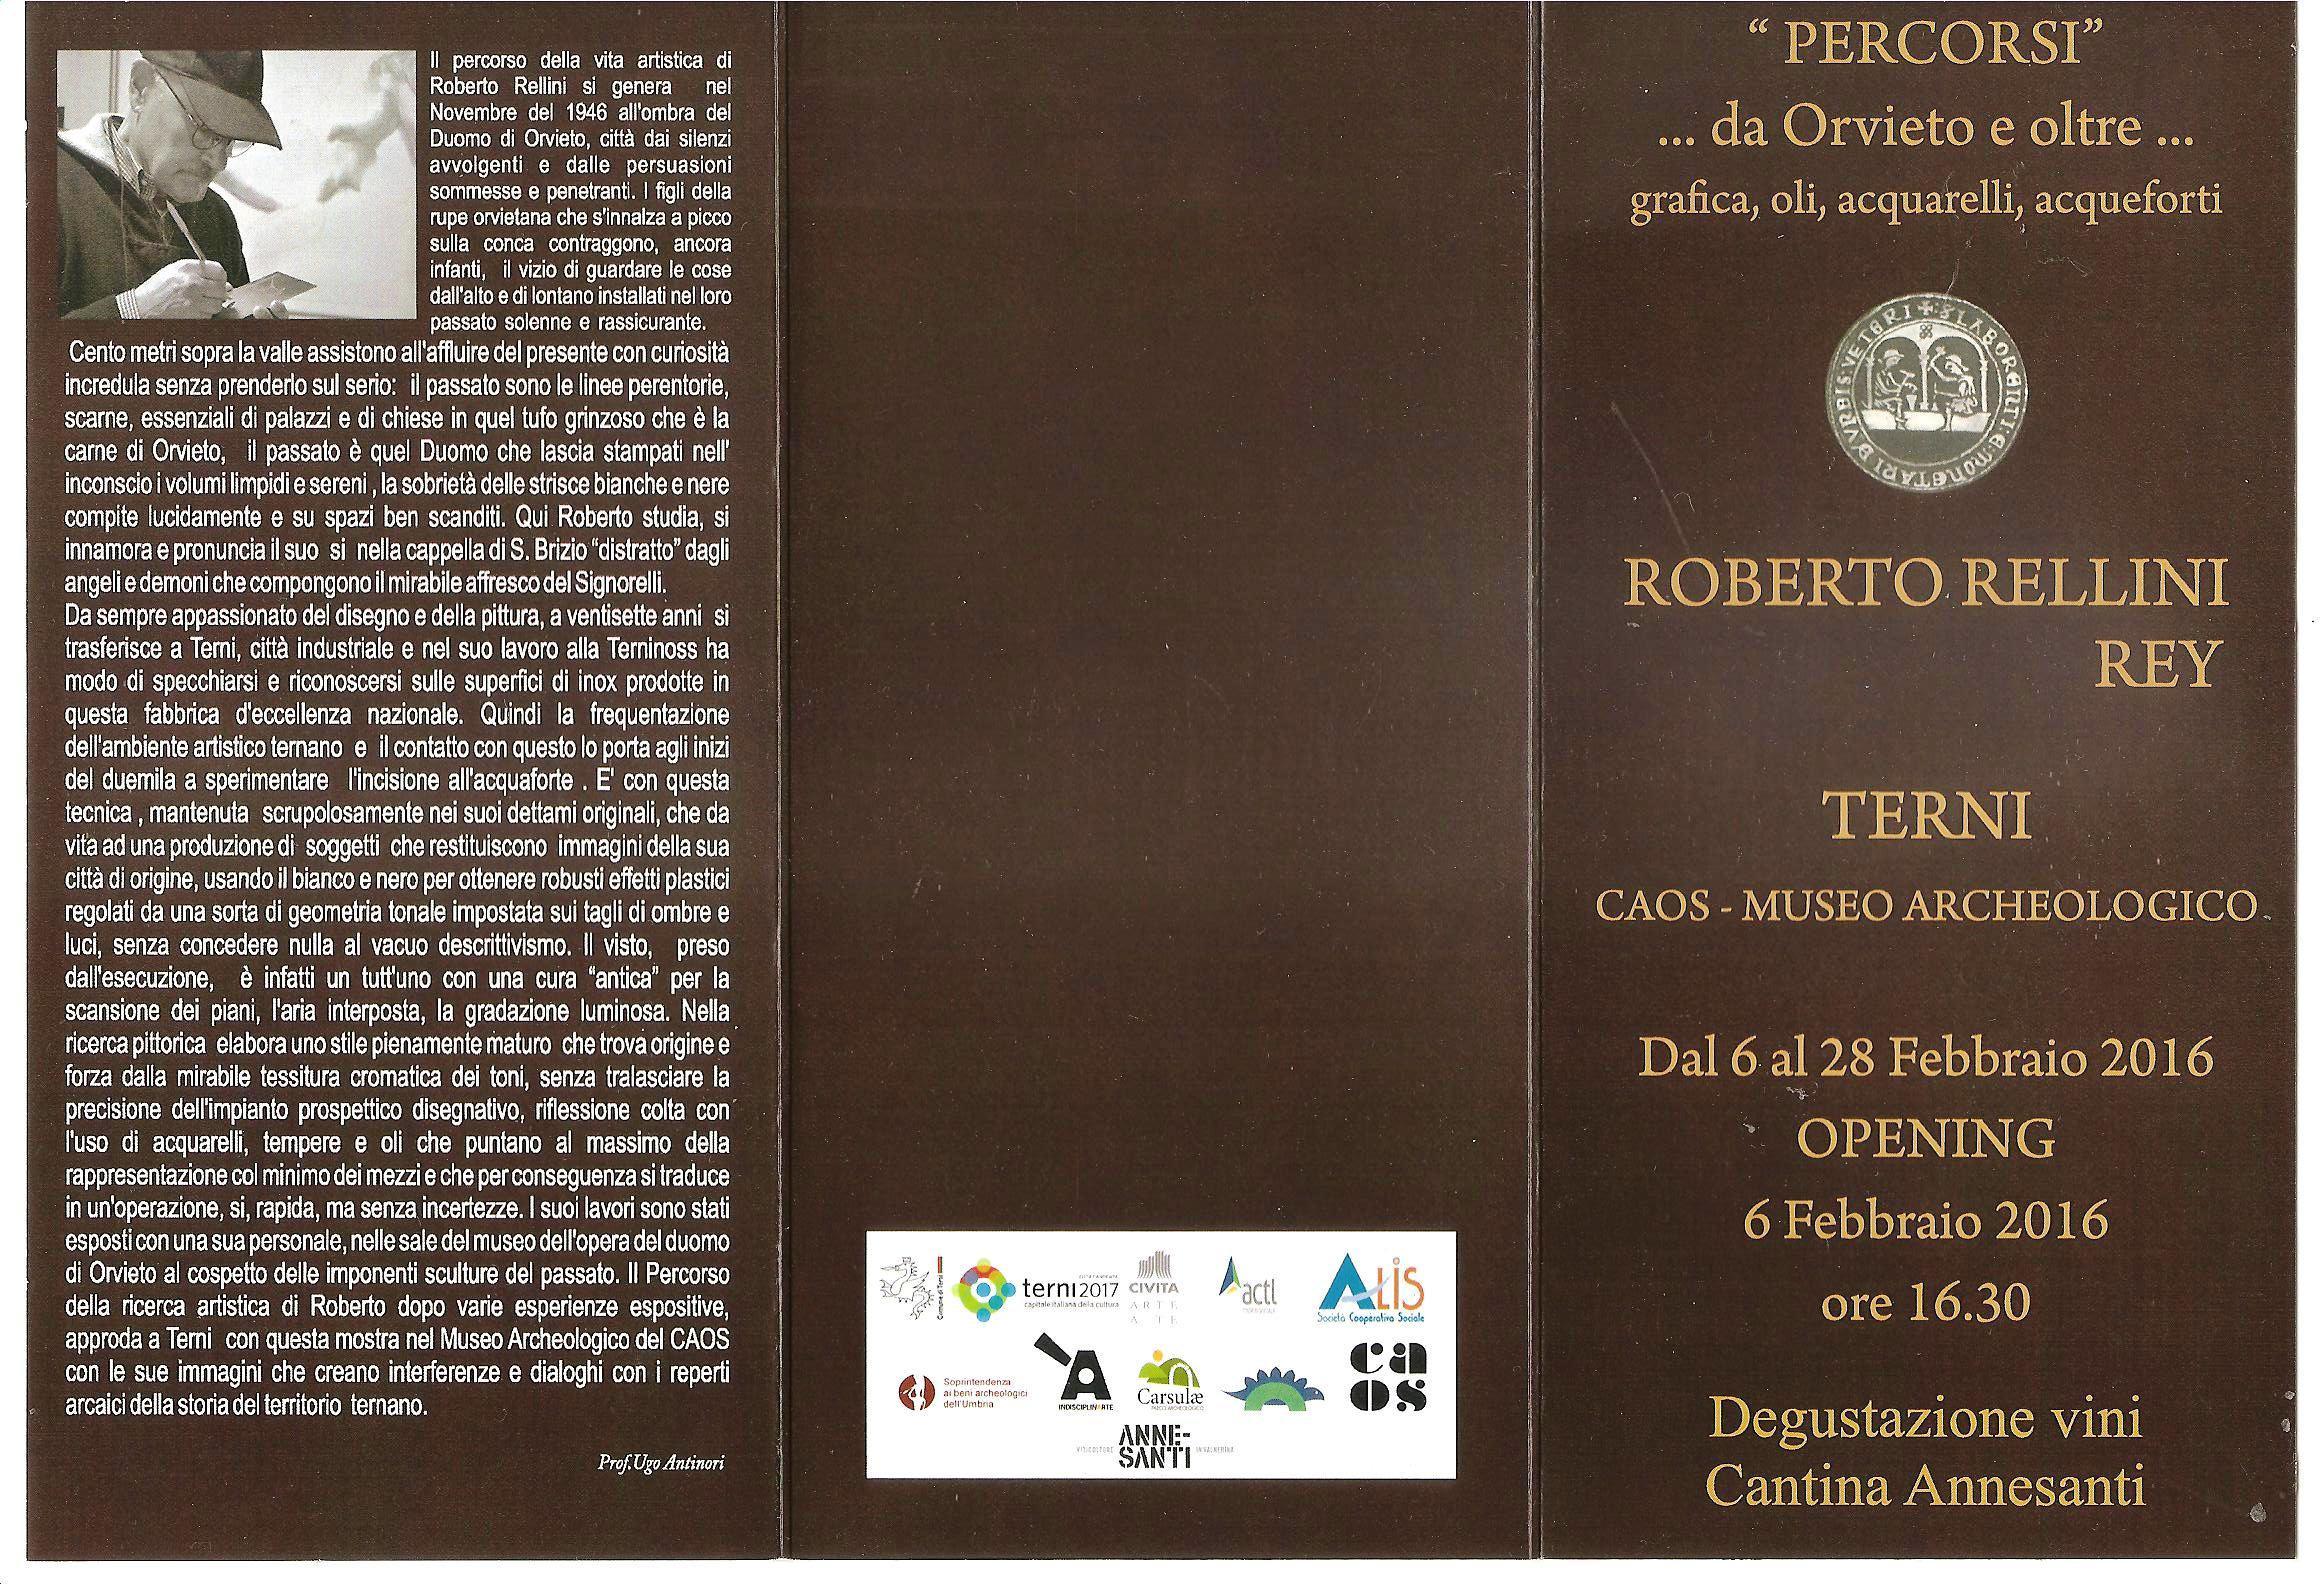 Annesanti brochure 2(1)